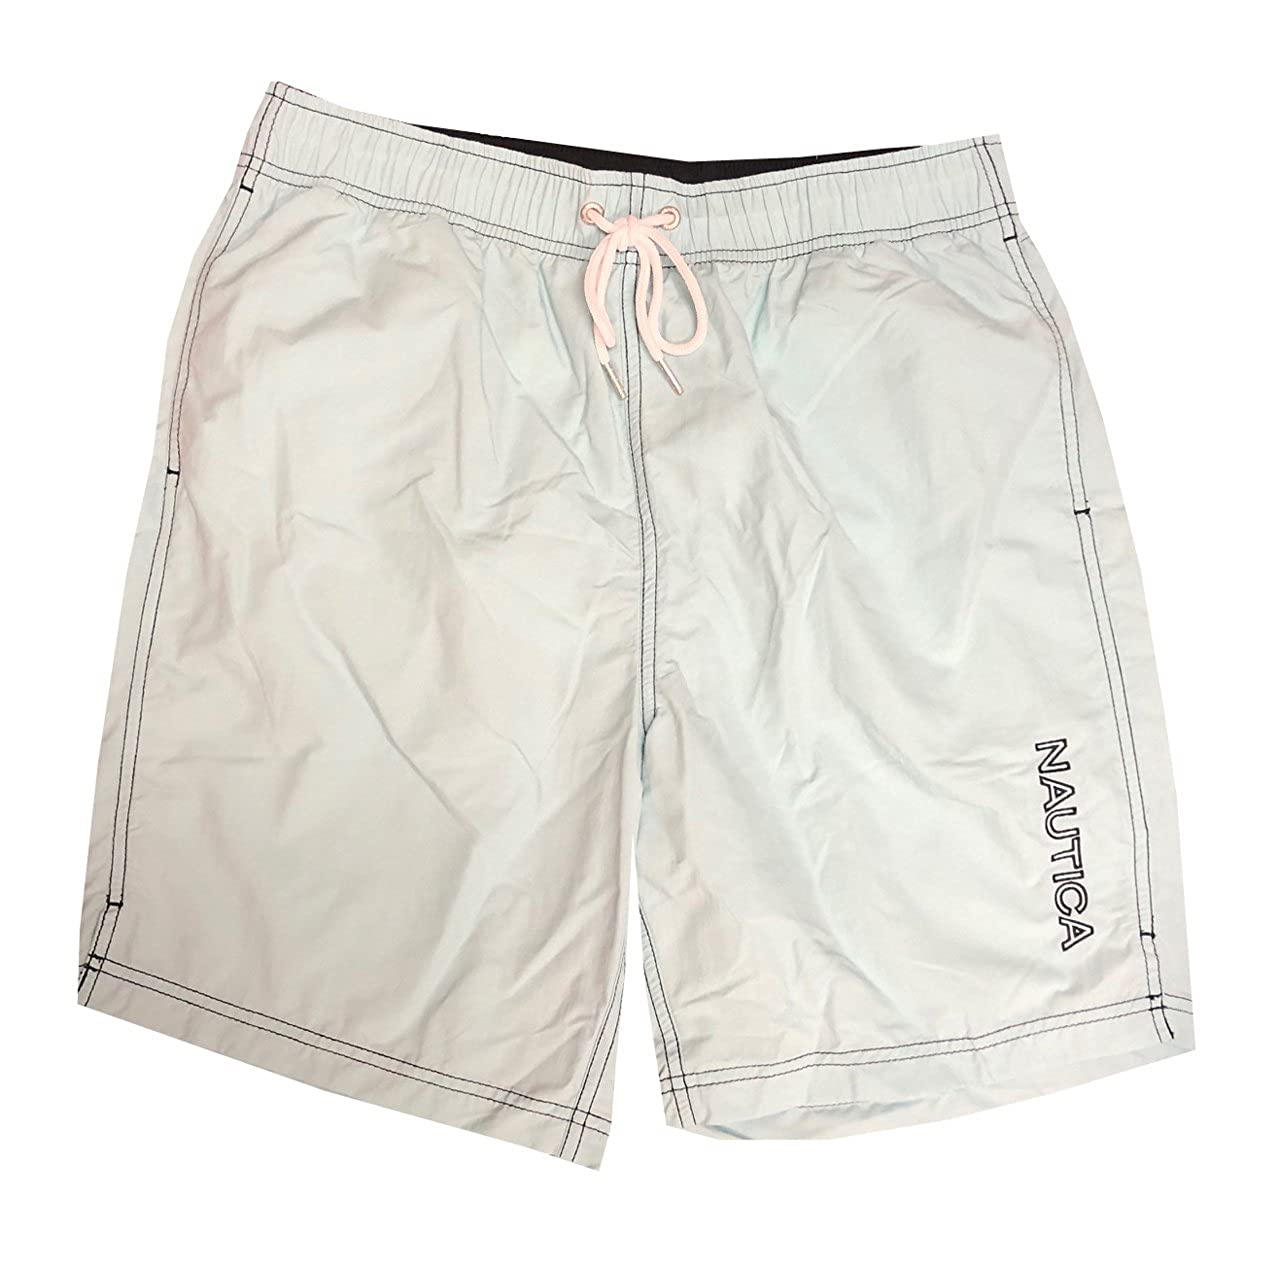 Nautica Mens Quick-Dry Logo Swim Trunk Shorts